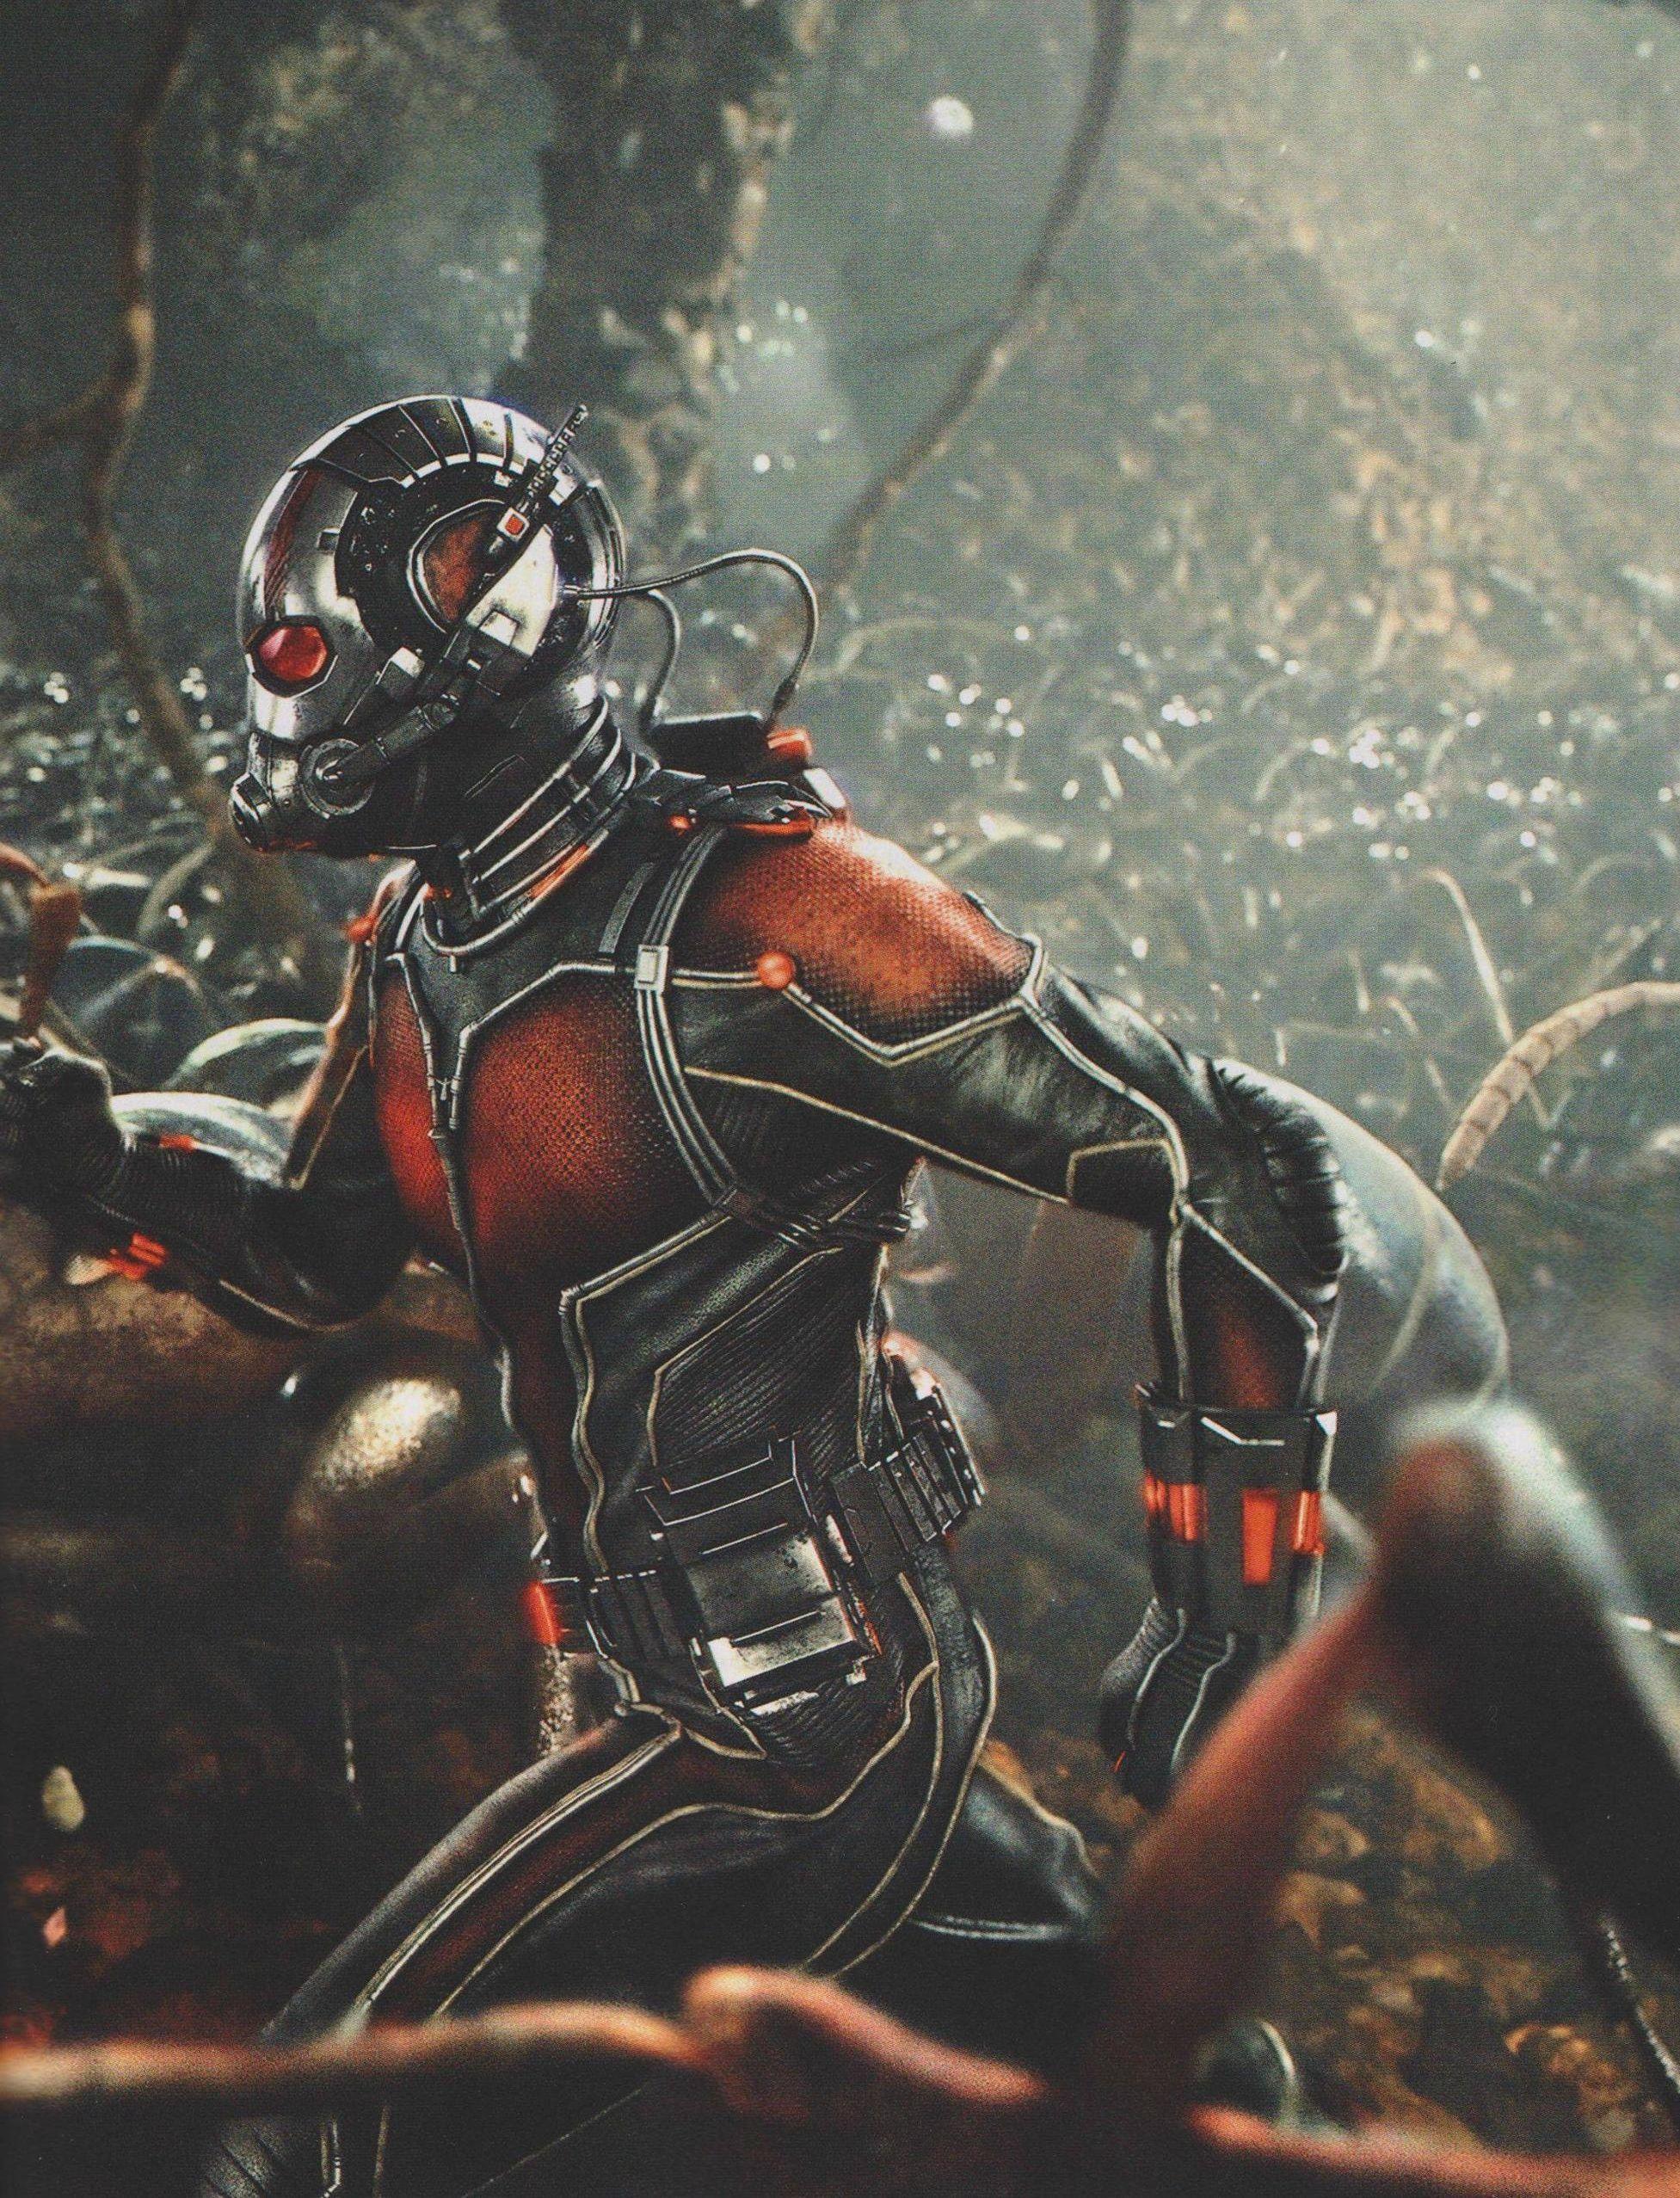 Still from Ant-Man in new Empire magazine